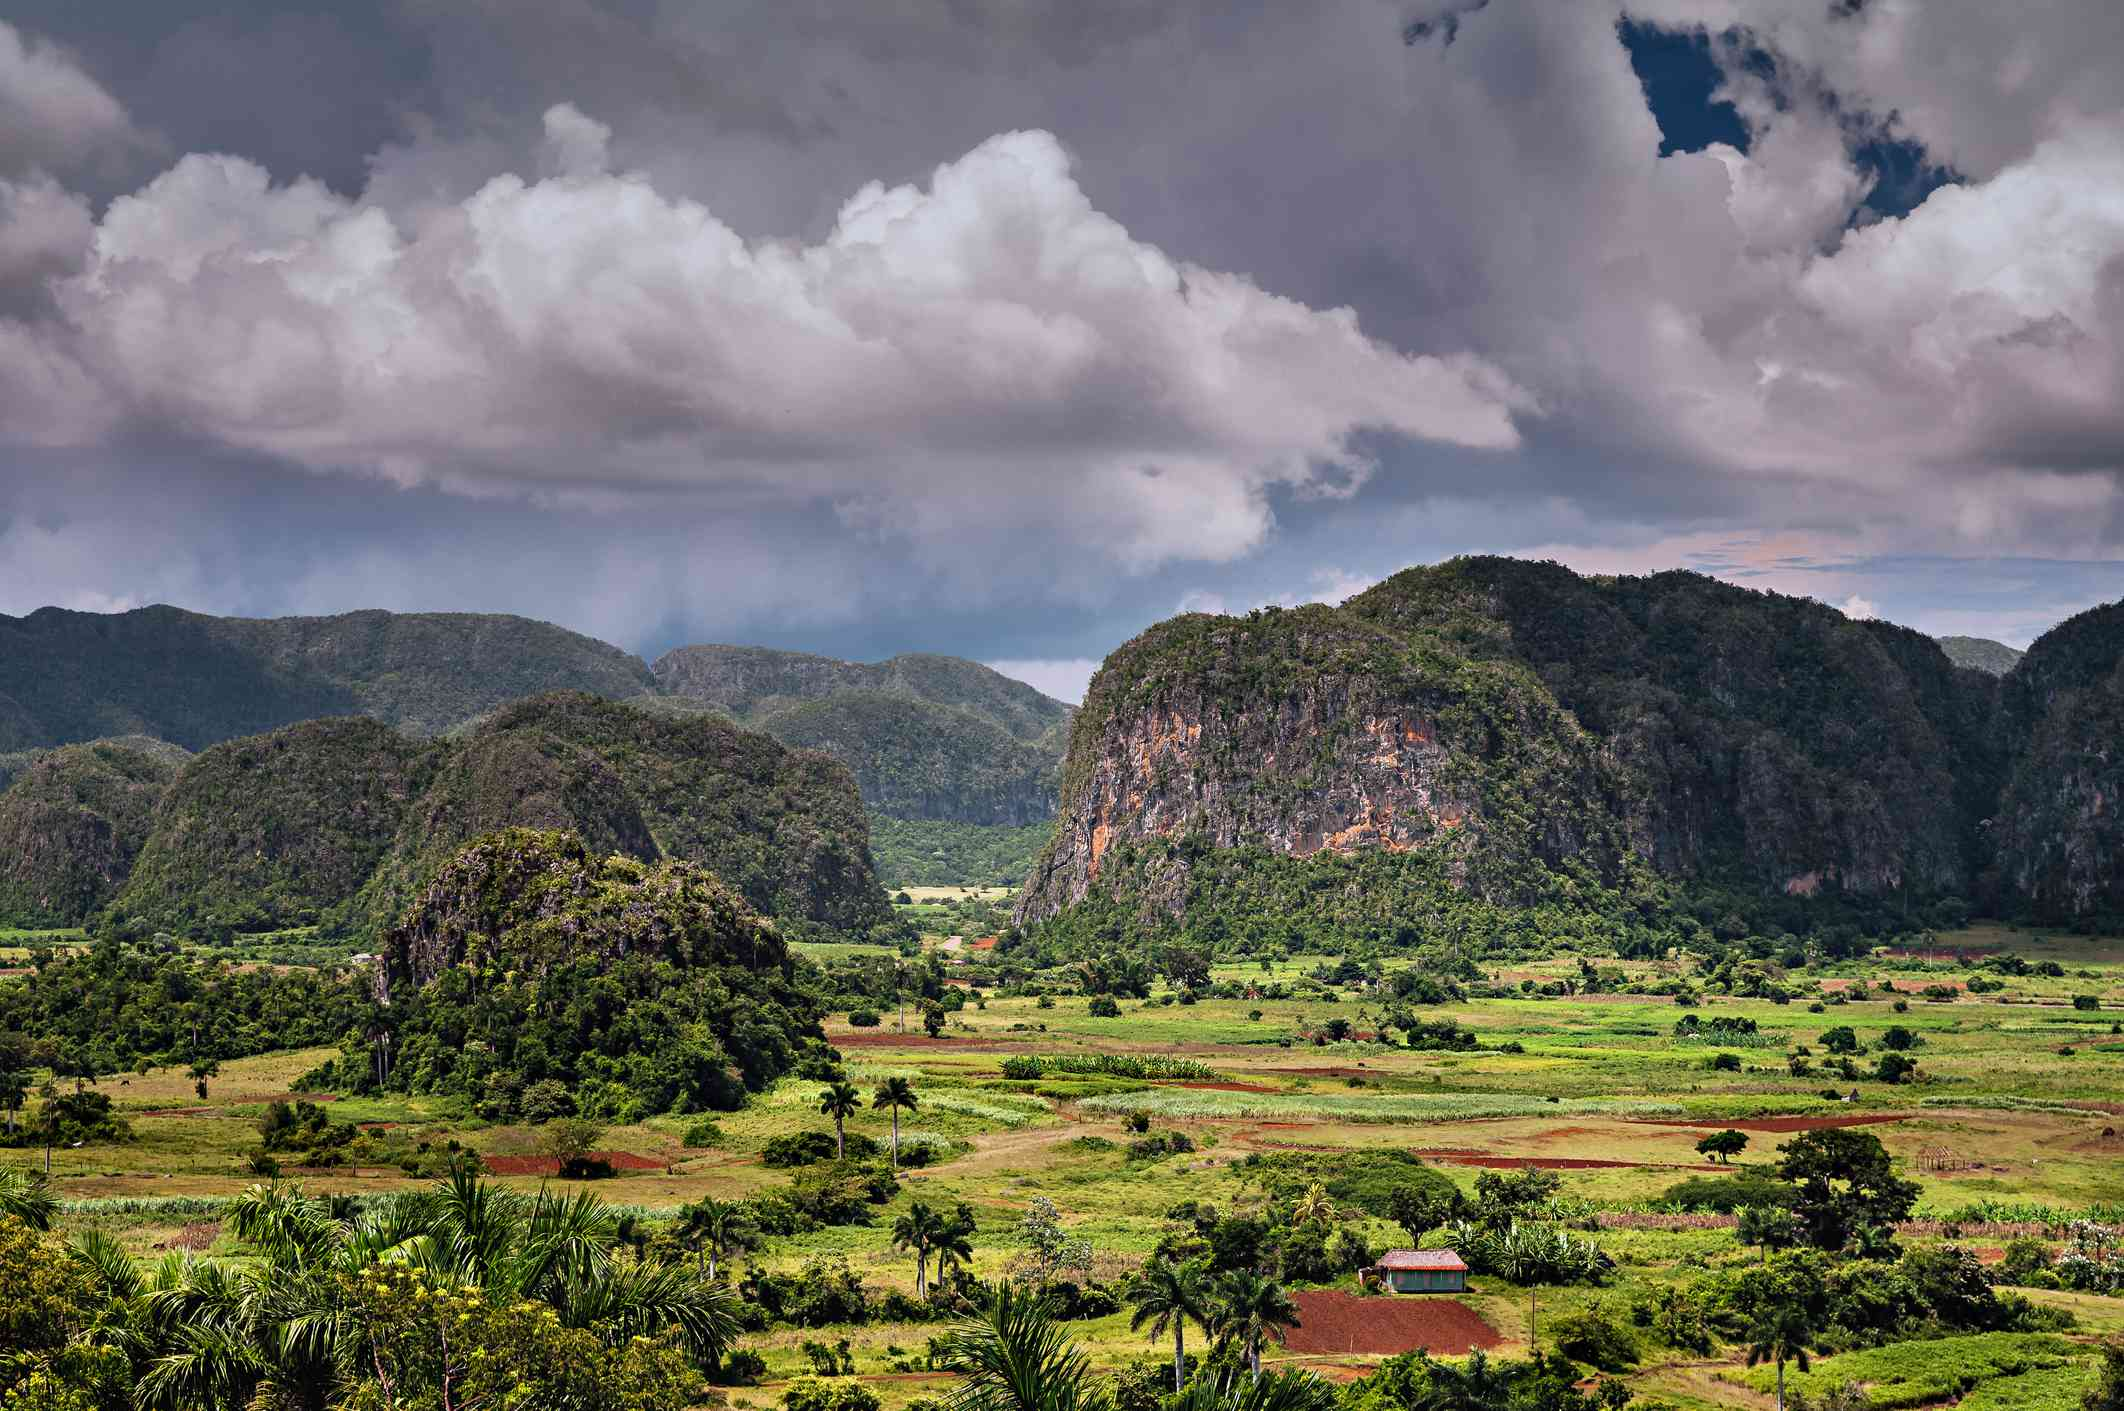 Rural landscape, Vinales, Pinar del Rio, Cuba